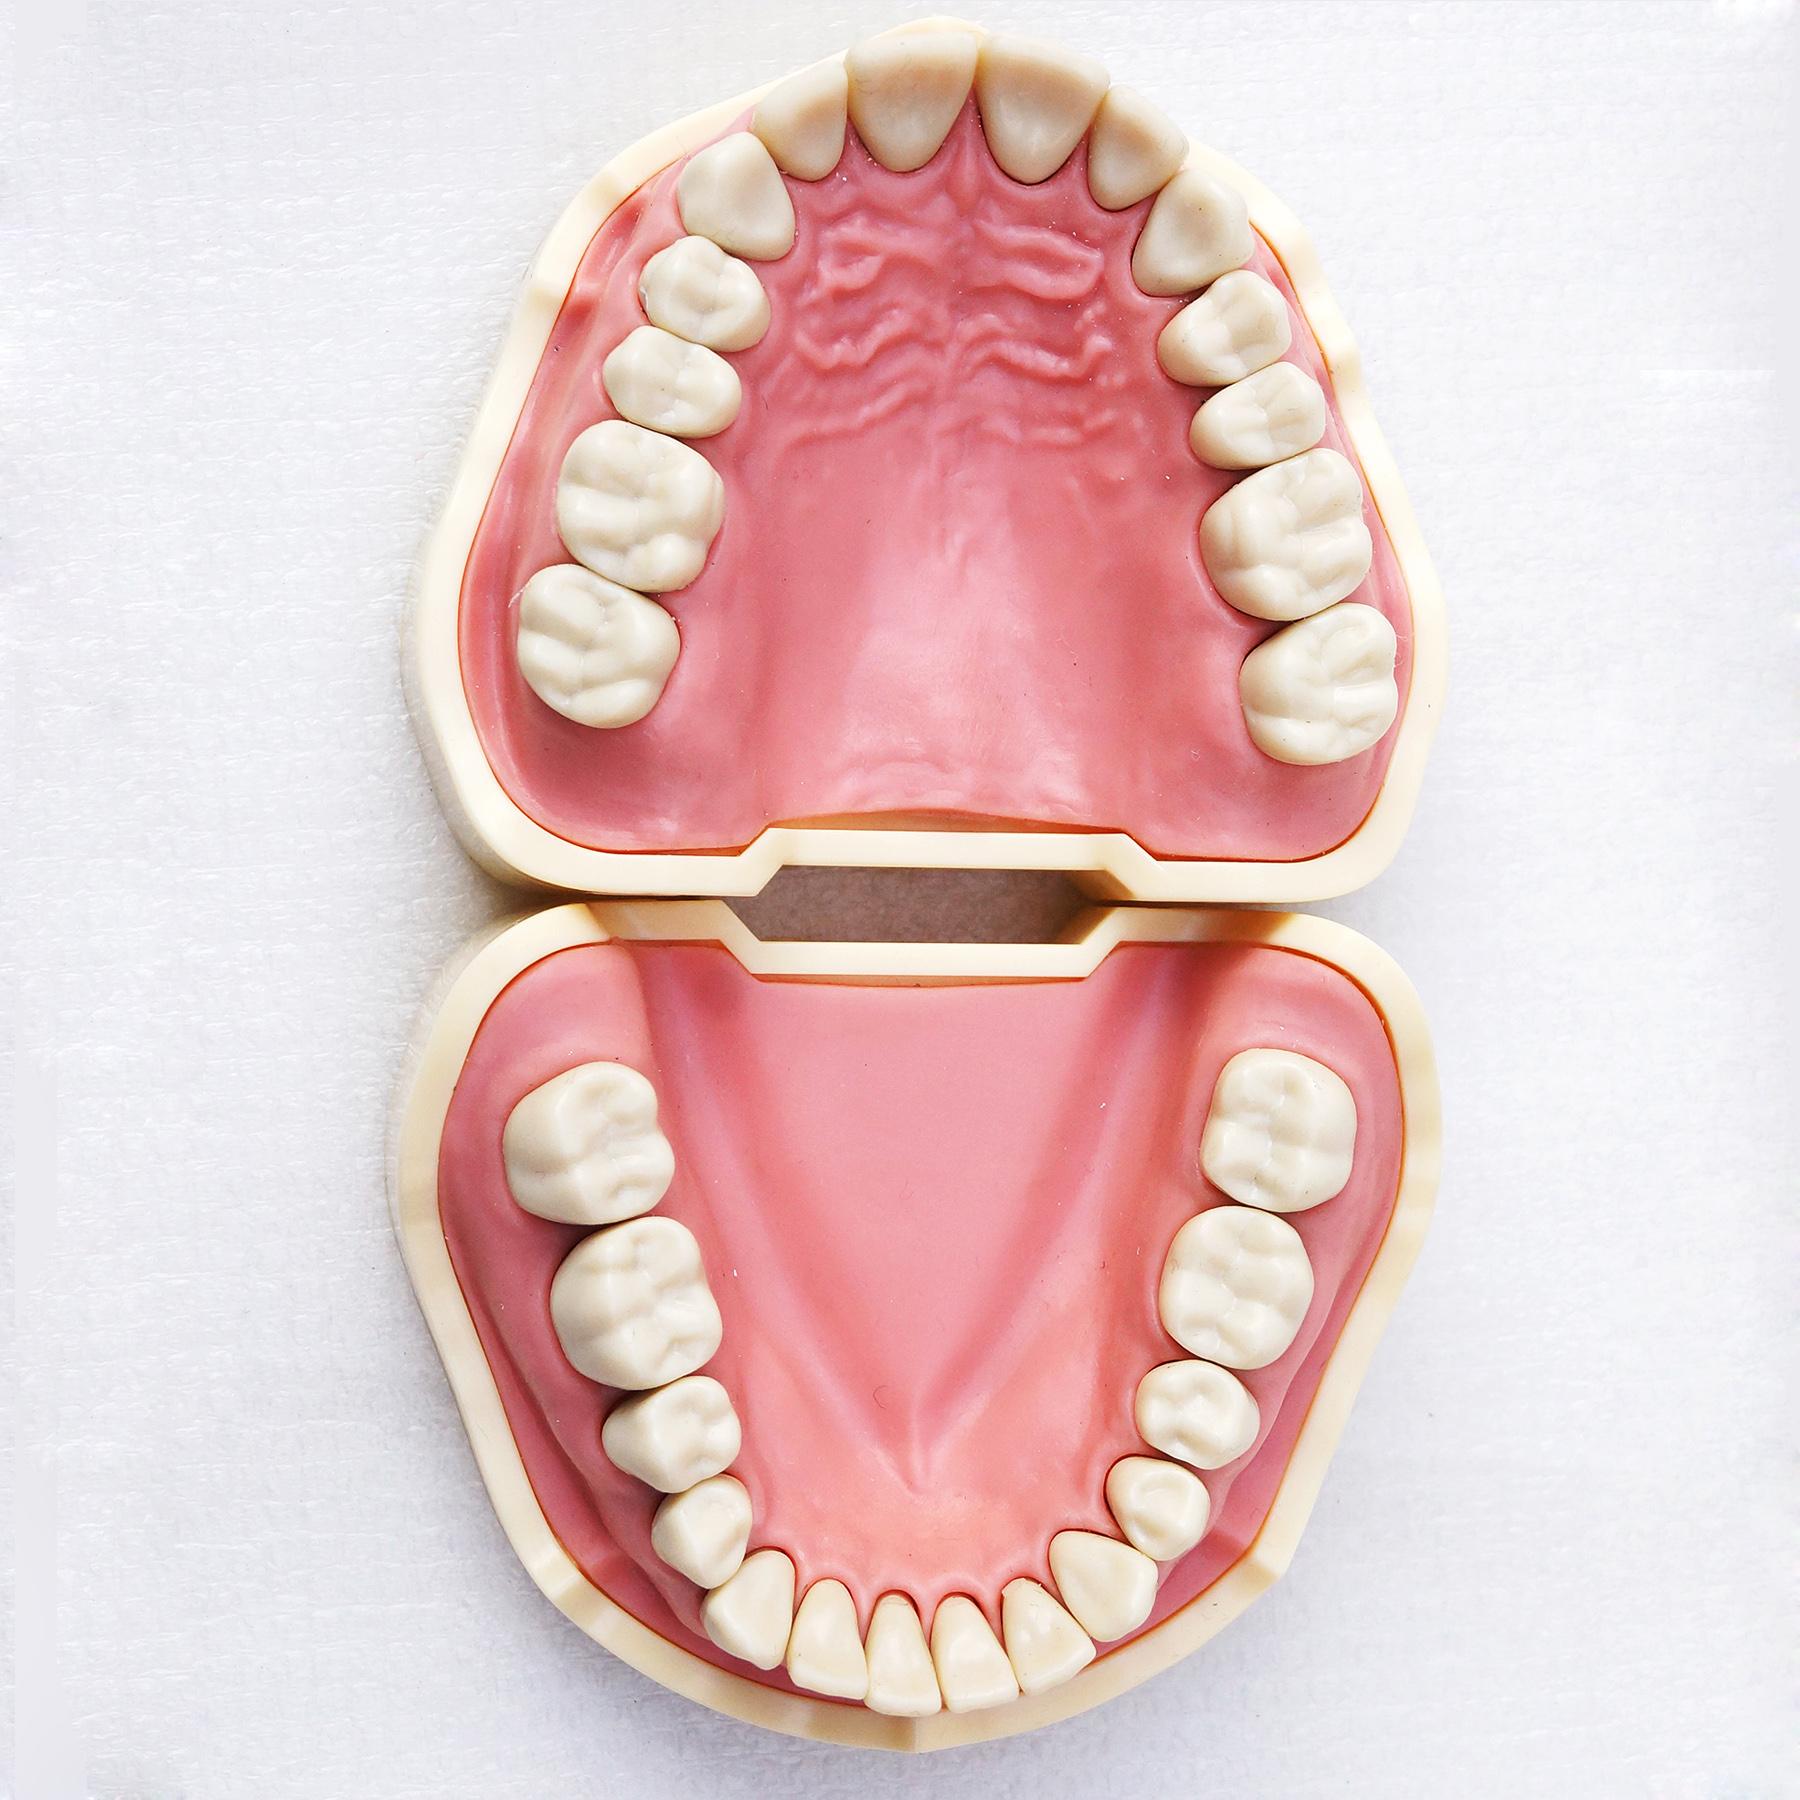 TM-A5-01 Standard Model, Dental Teeth Model Study And Teach Soft Gum BF Style 28pcs